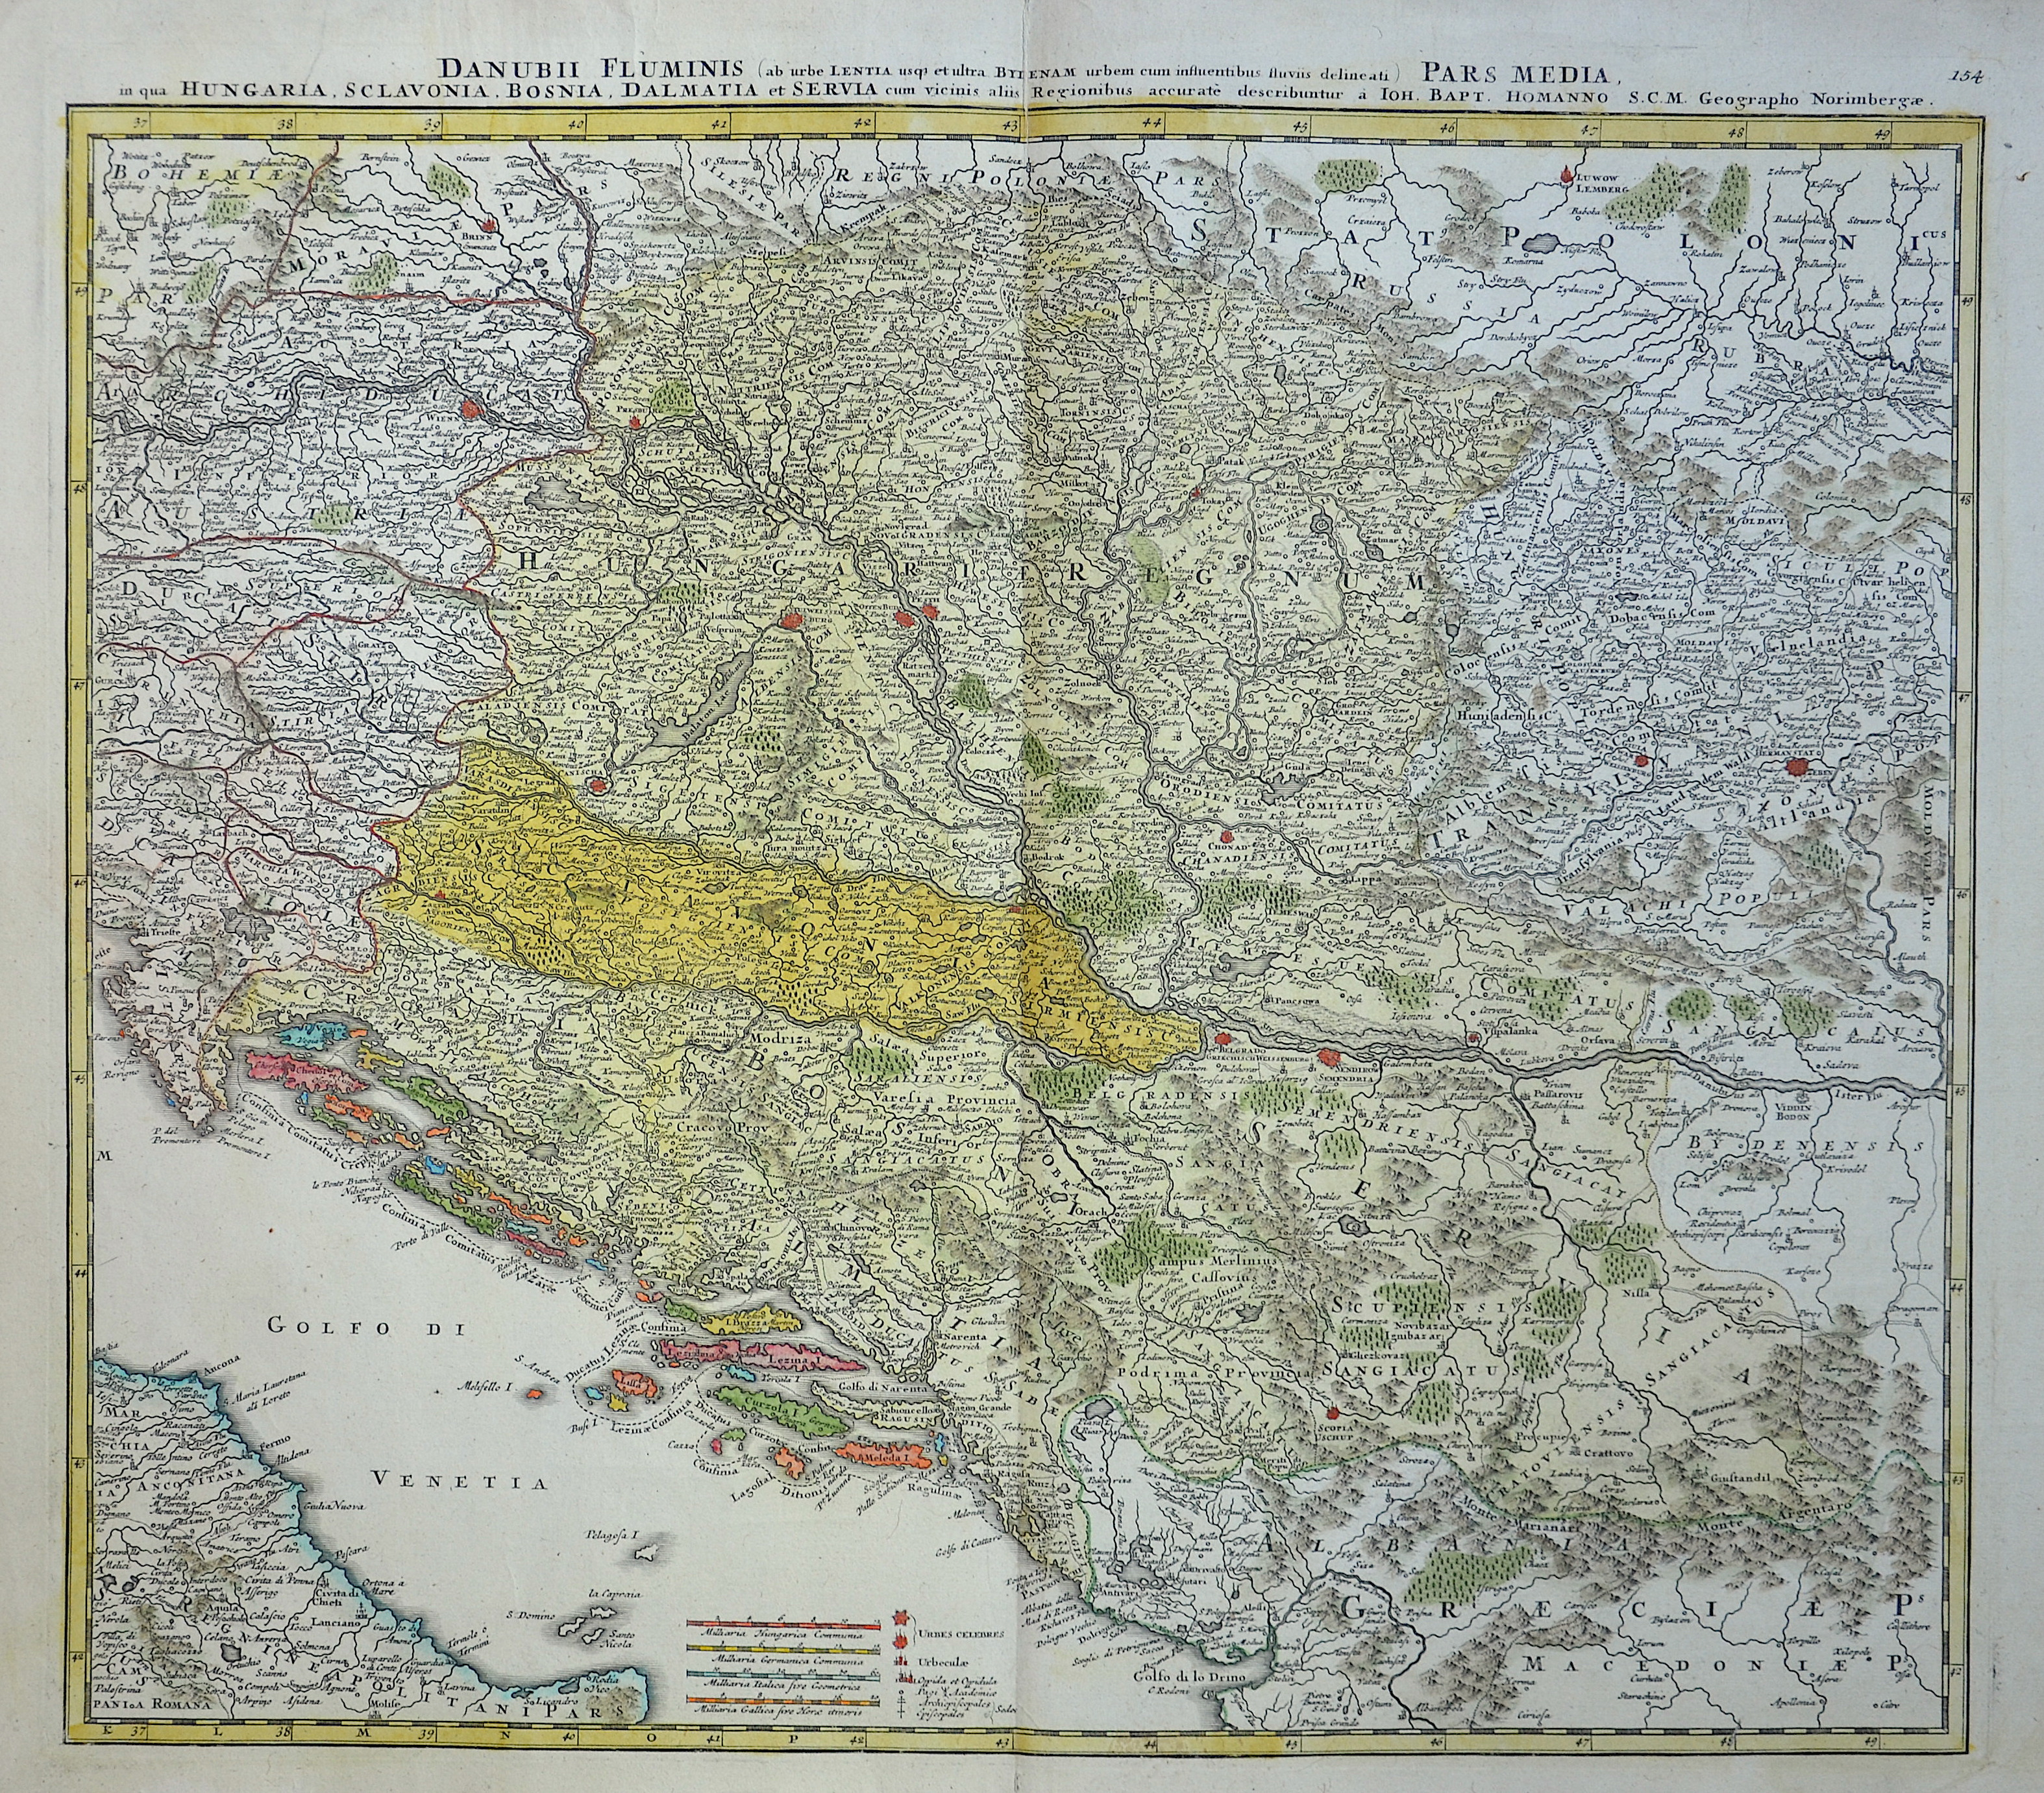 Homann  Danubii Fluminis pars media in qua Hungaria, Sclavonia, Bosnia, Dalmatia et Servia